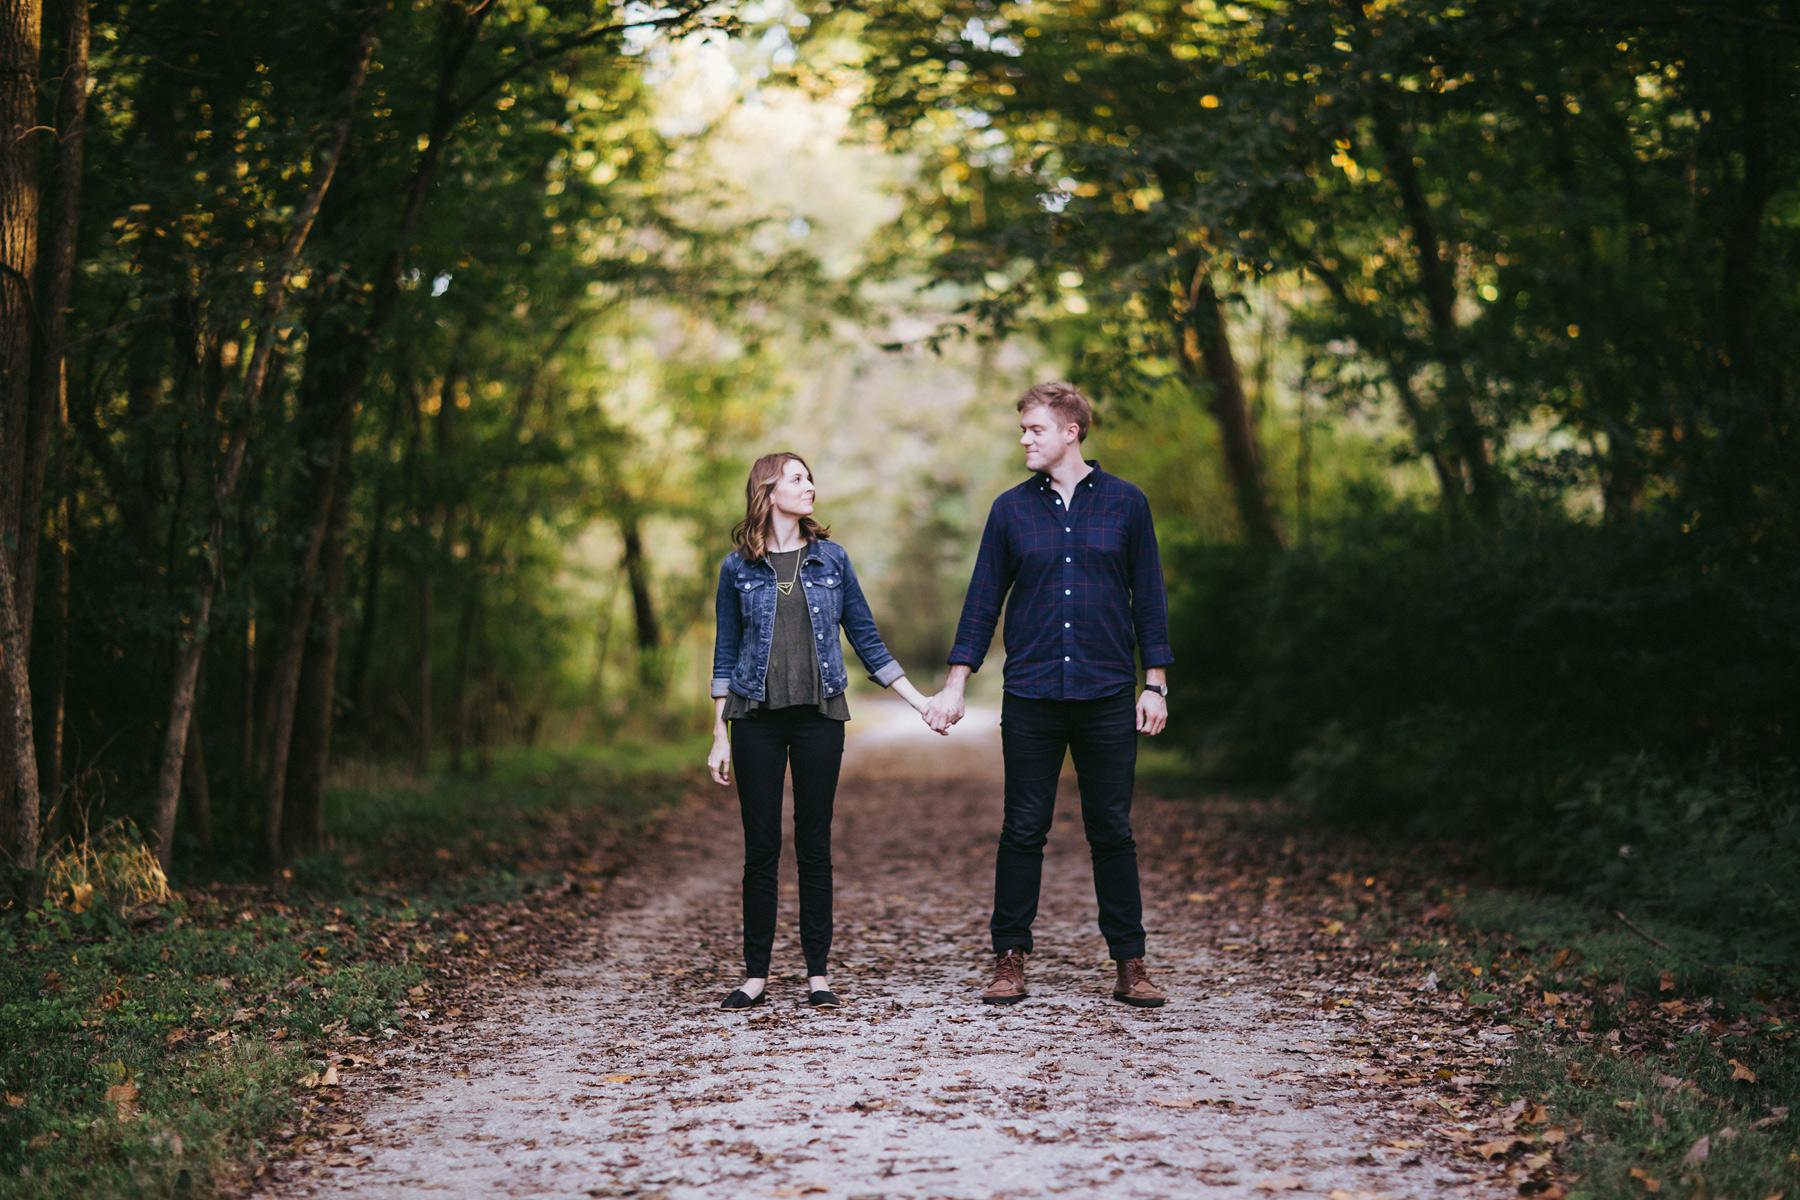 Capen Park Riverside Forest Engagement Photos_Kindling Wedding Photography Blog34.JPG